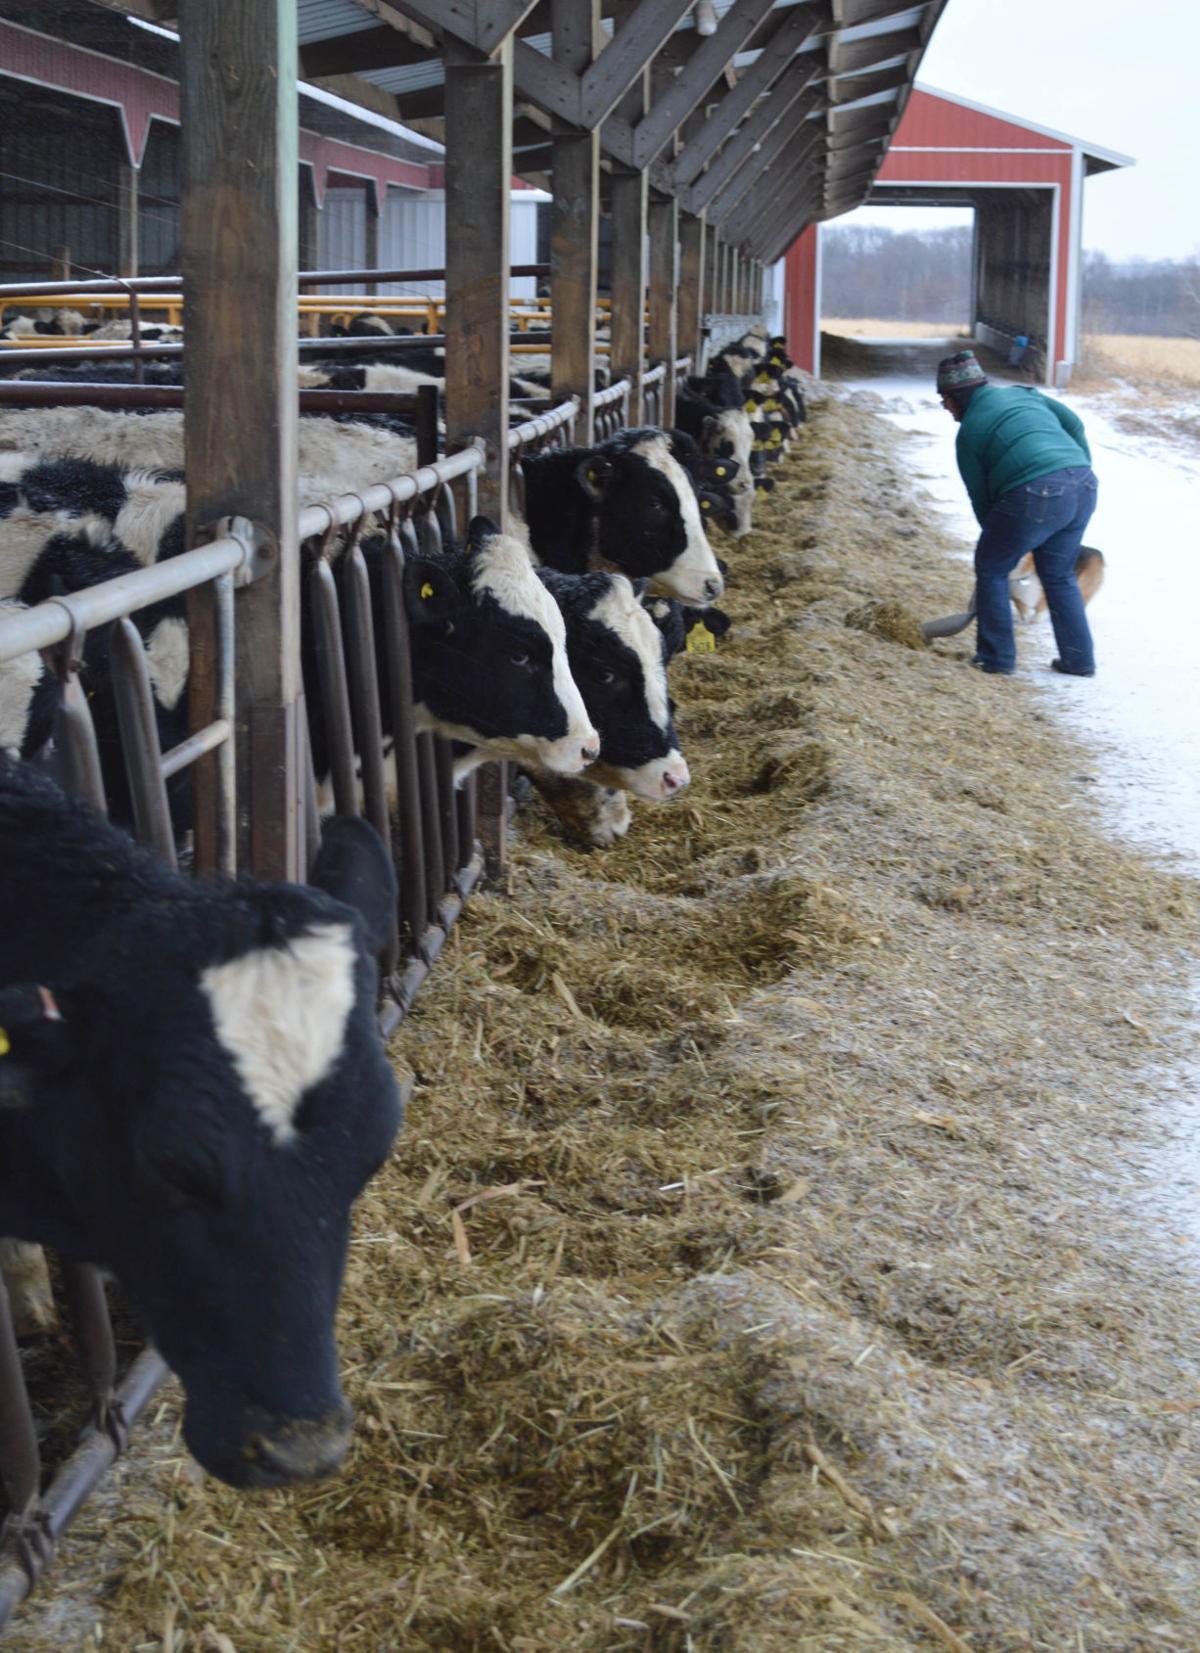 020118-dell-news-milkprices-1